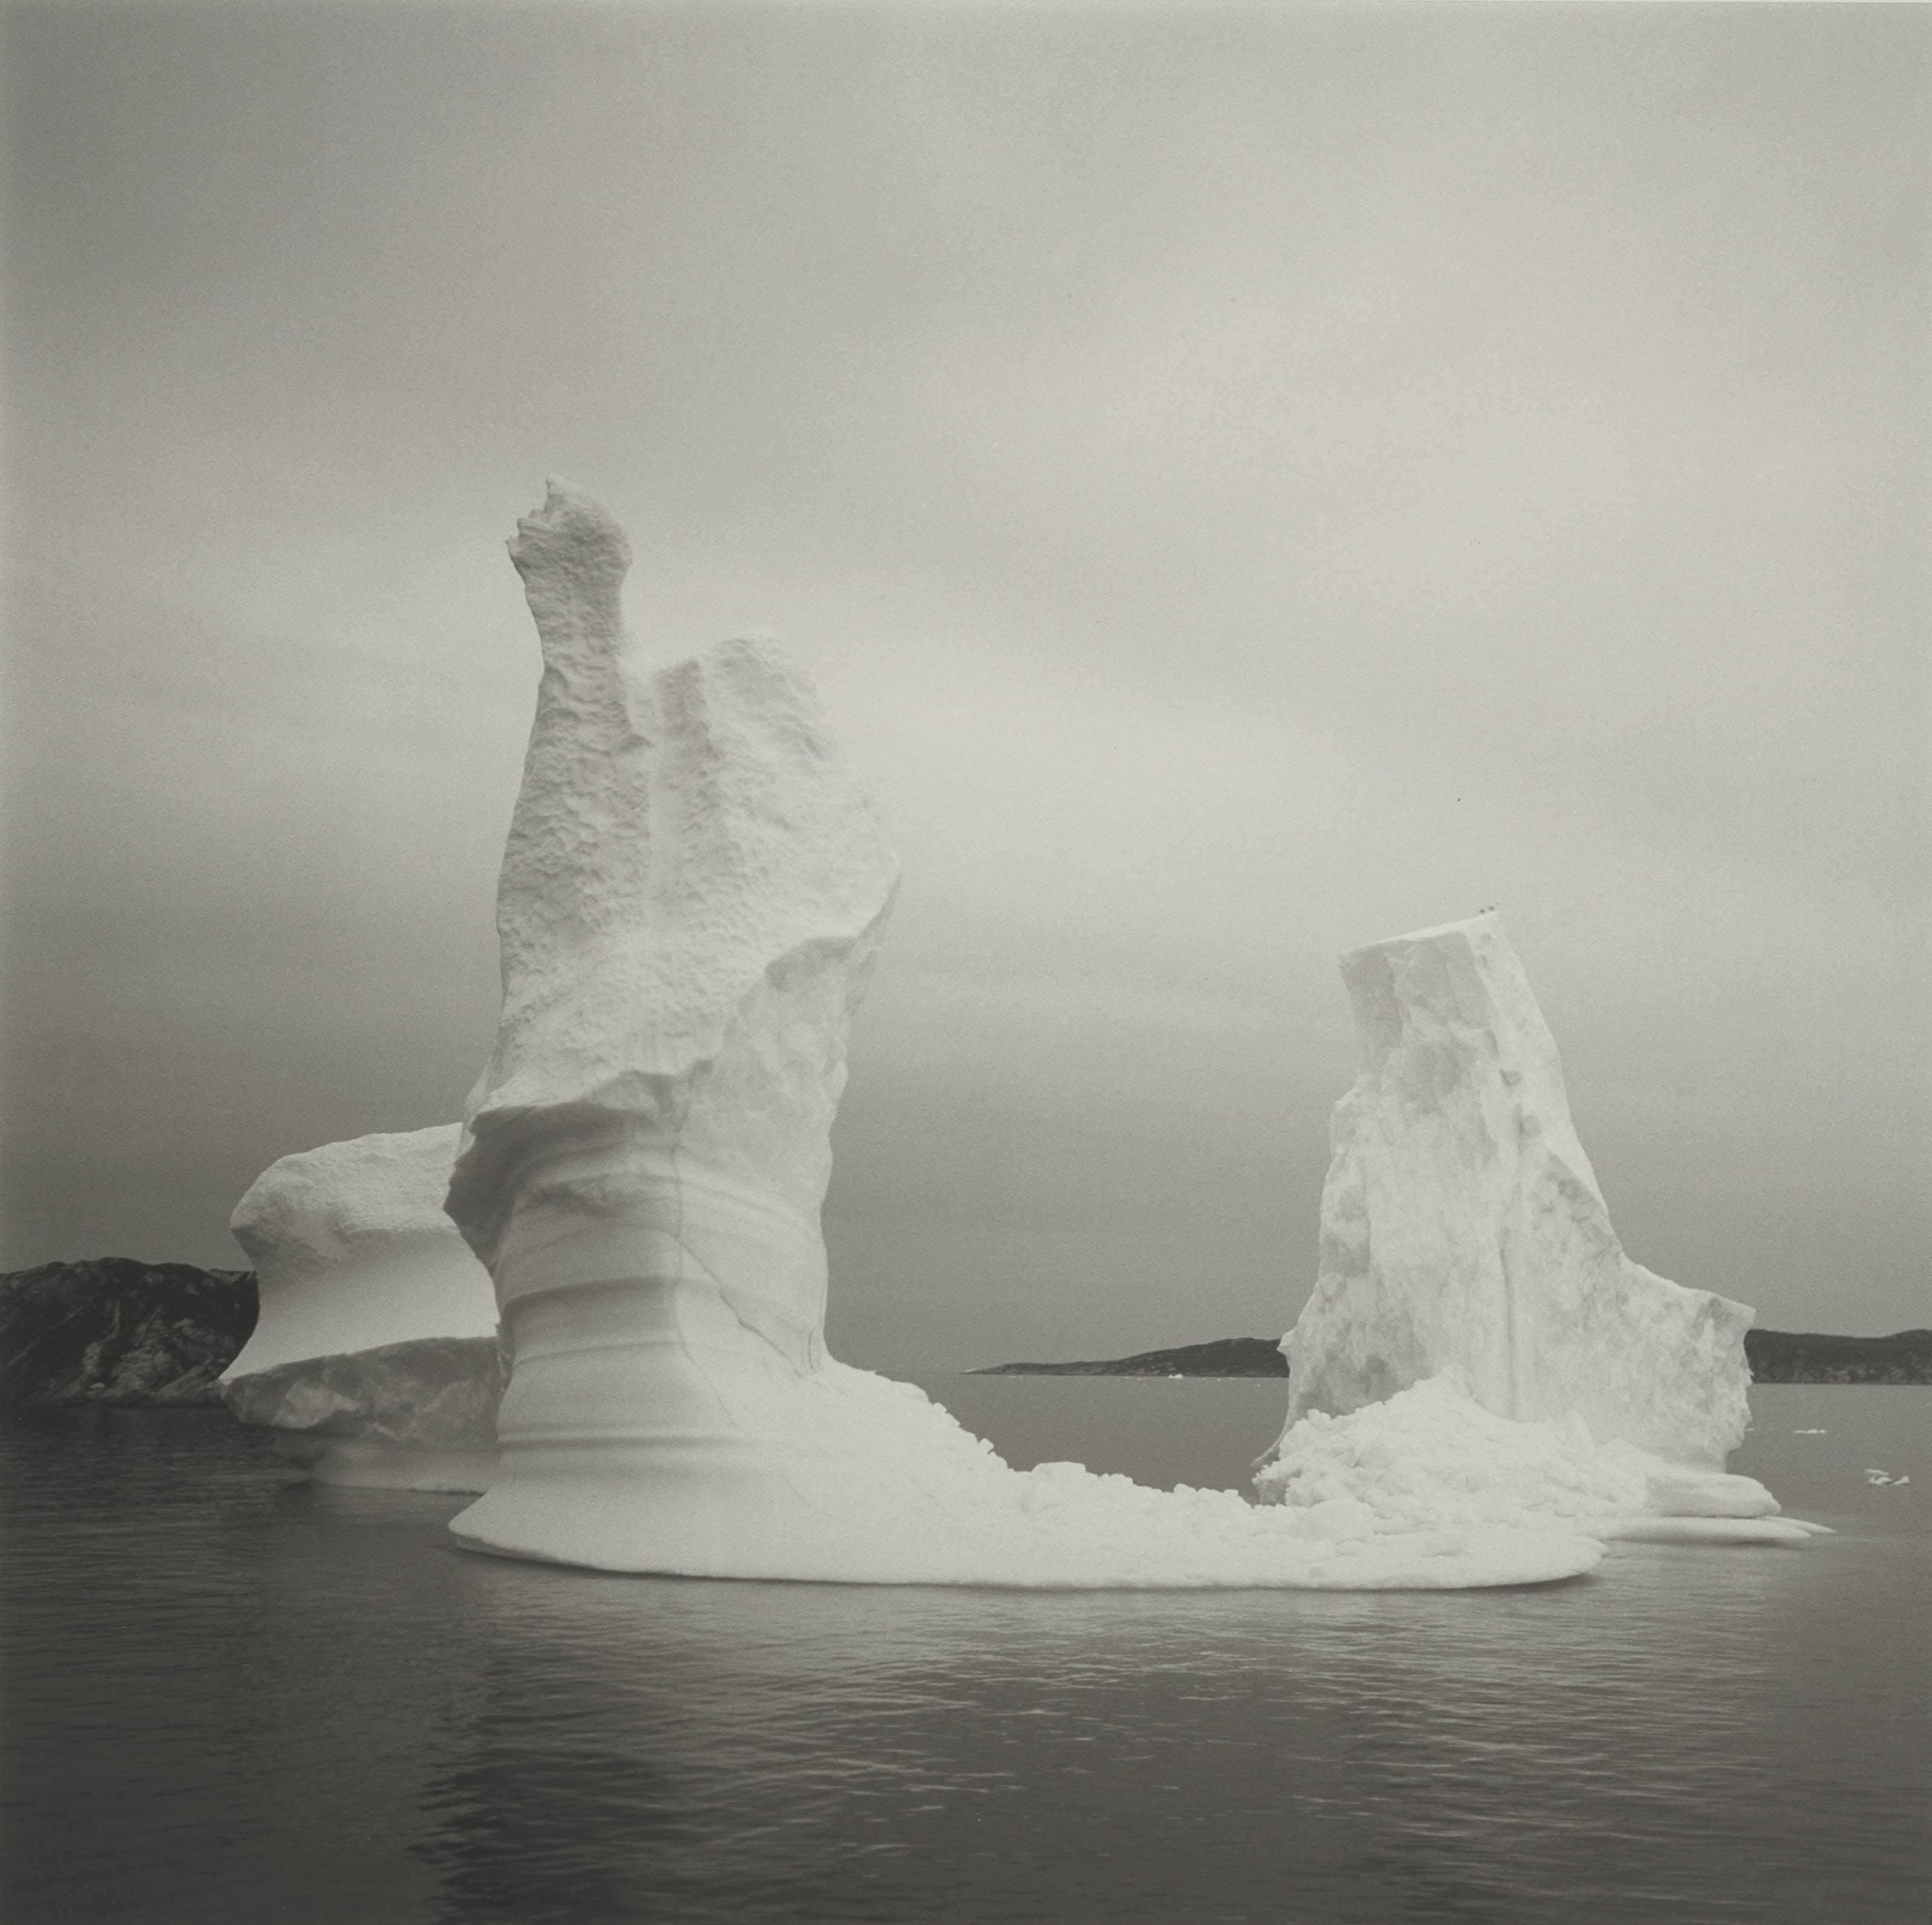 Iceberg #19, Disko Bay, Greenland, 1986